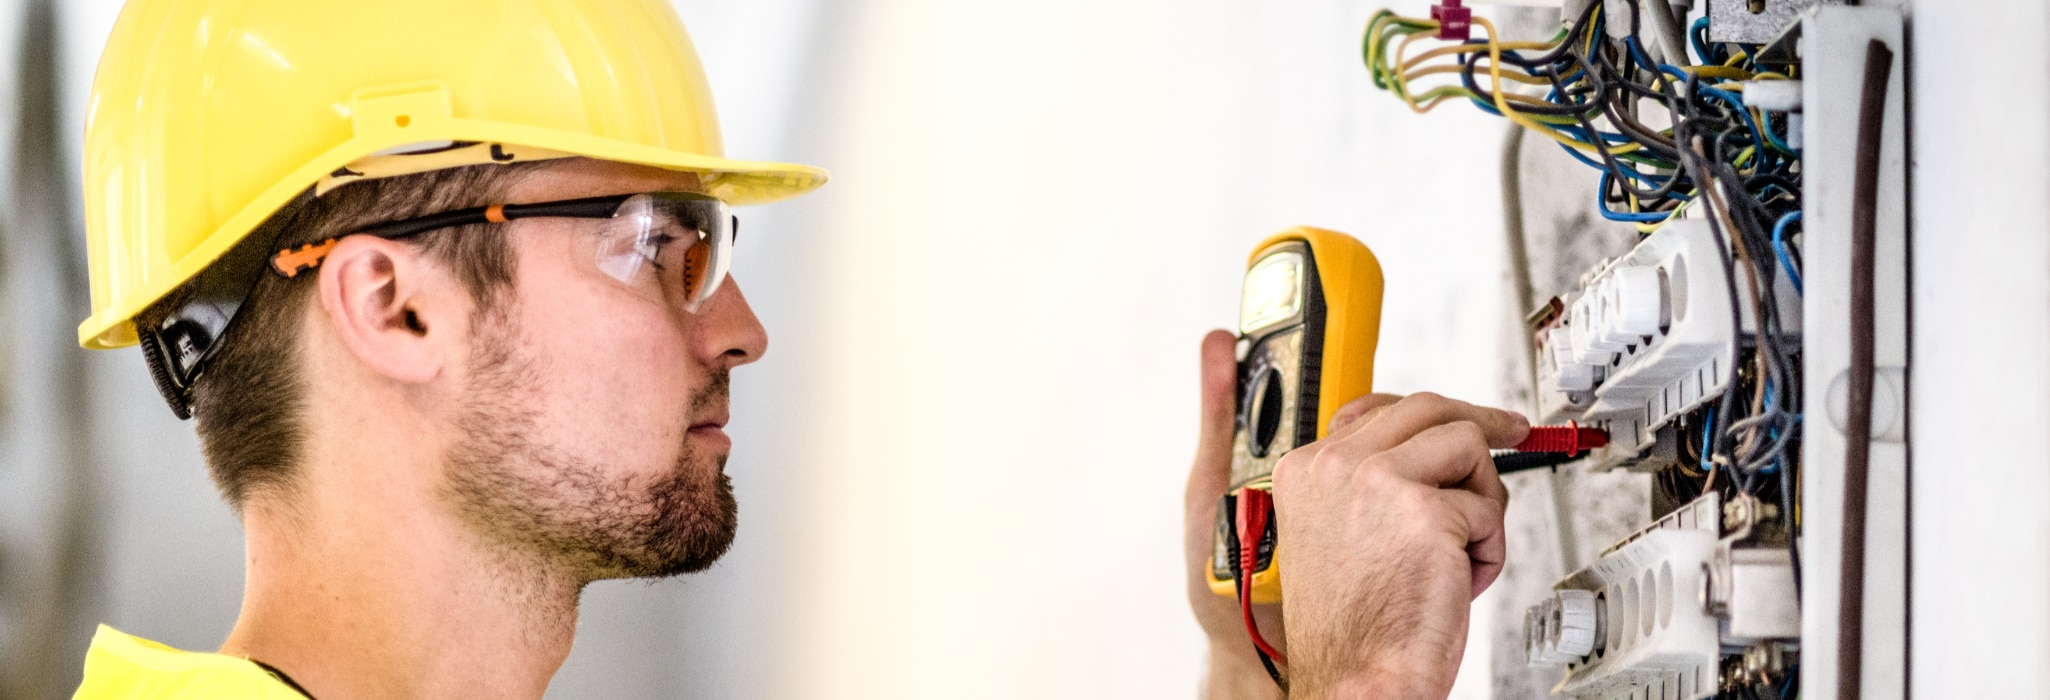 Electrician repairing circuit breakers in industrial electric panel.